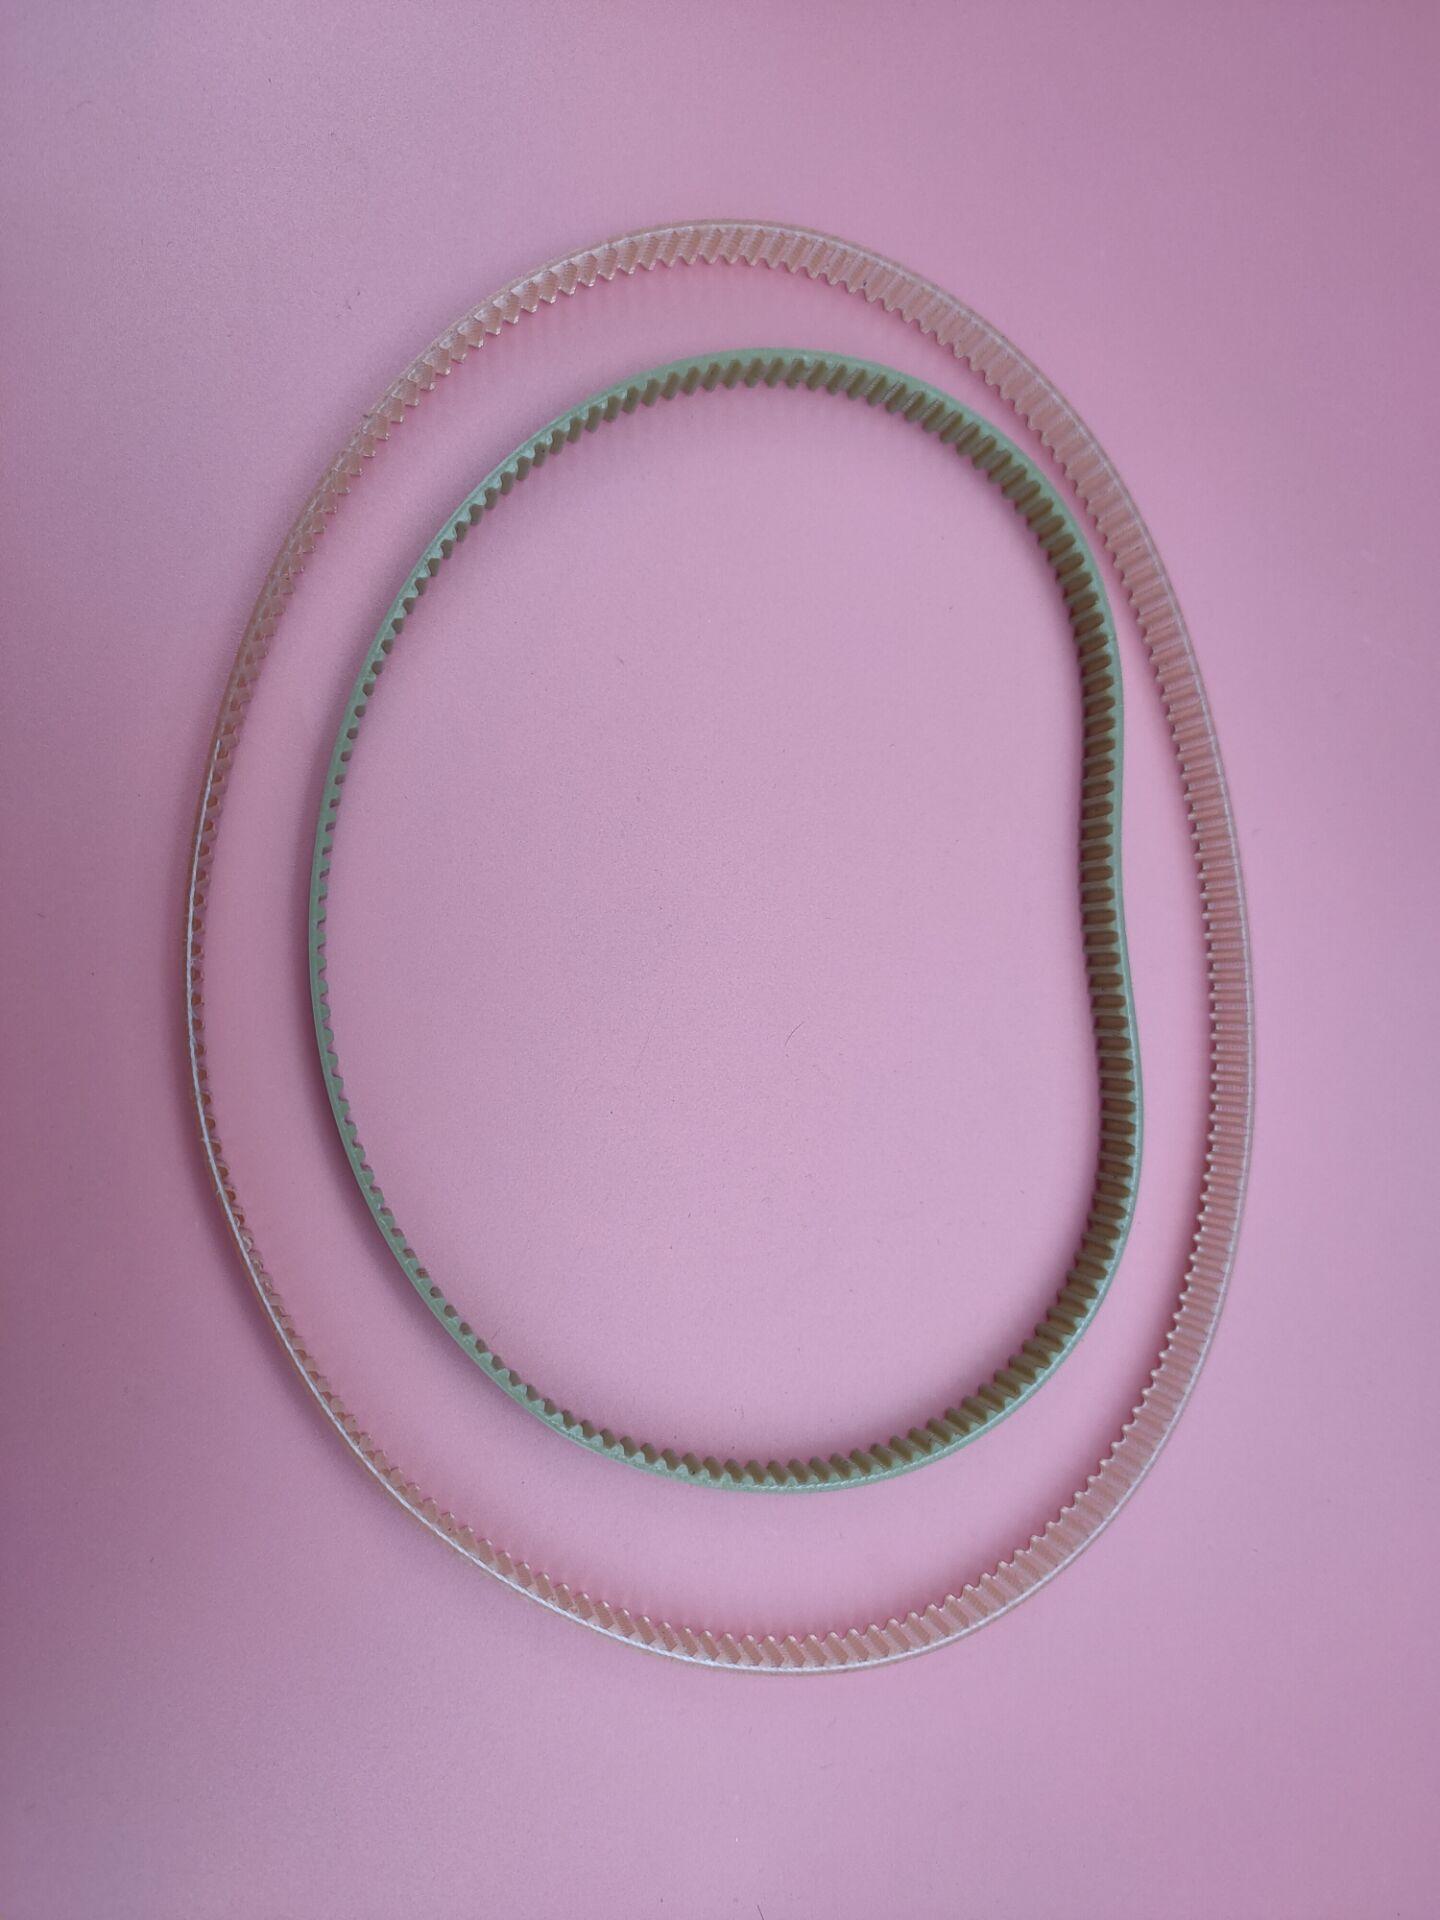 100%New-Replacement Bread-Maker-Machine-Belt for Severin-Bm3986